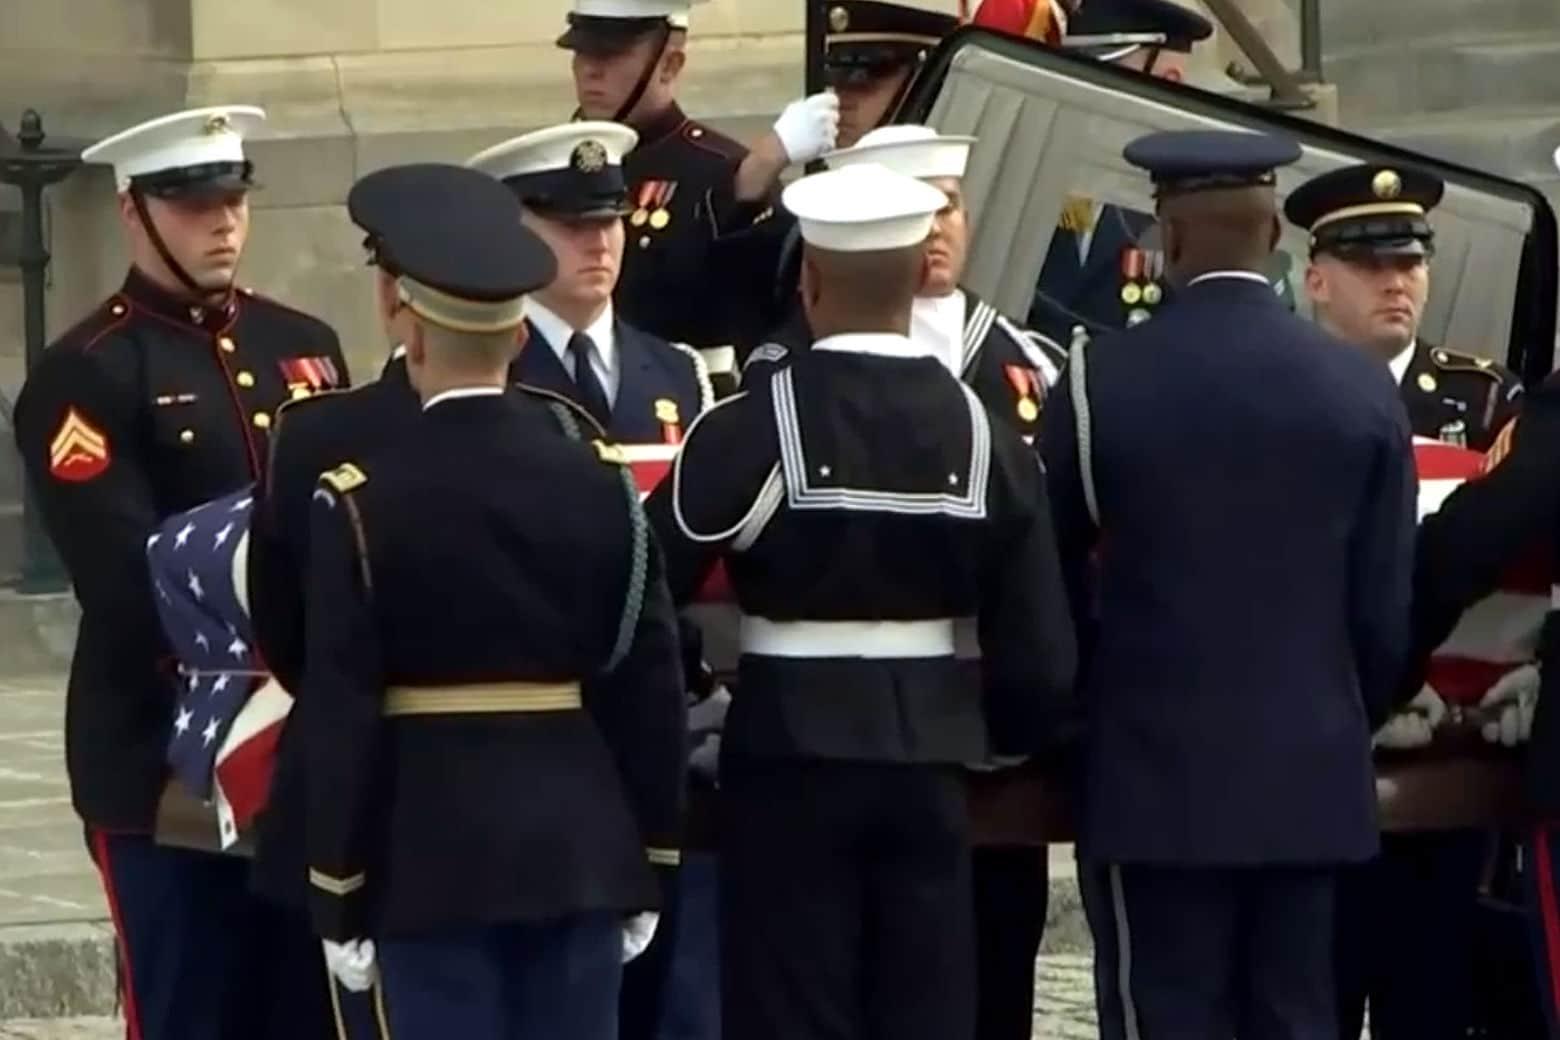 Former President George H.W. Bush's casket arrives at National Cathedral in Washington Dec. 03, 2018. (AP)